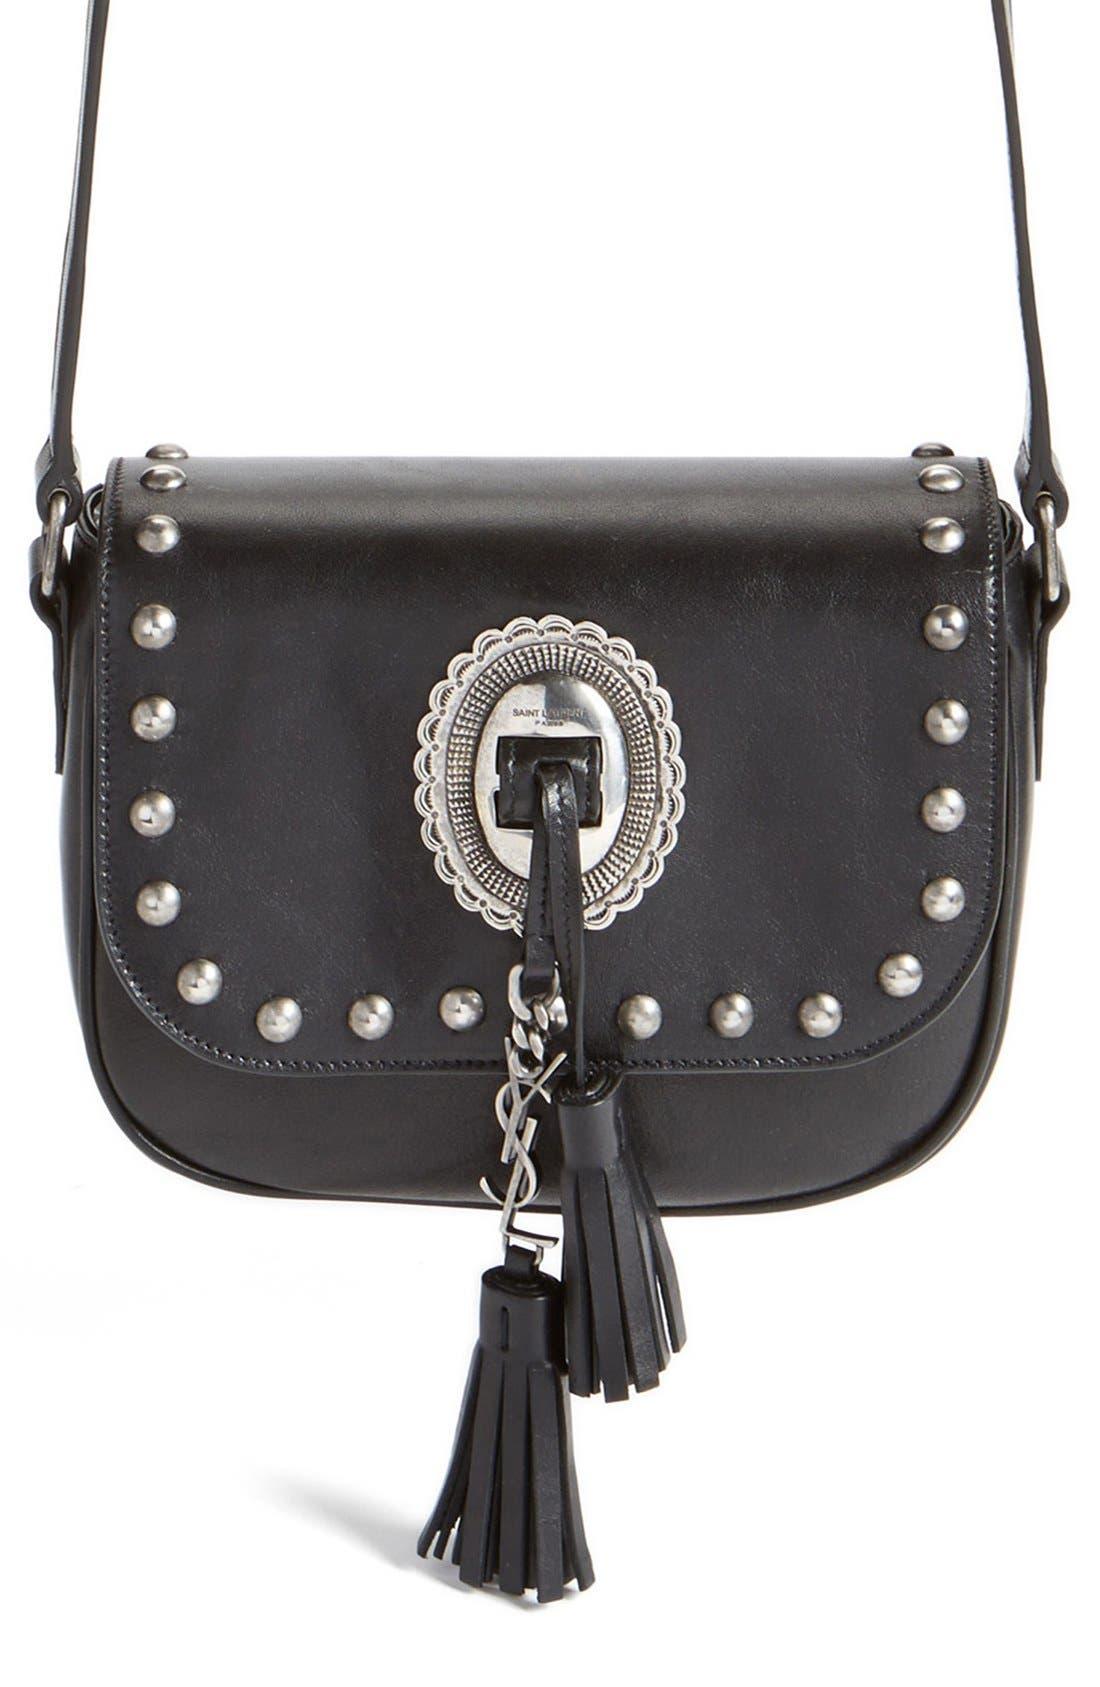 Main Image - Saint Laurent 'Small Kim' Calfskin Crossbody Bag